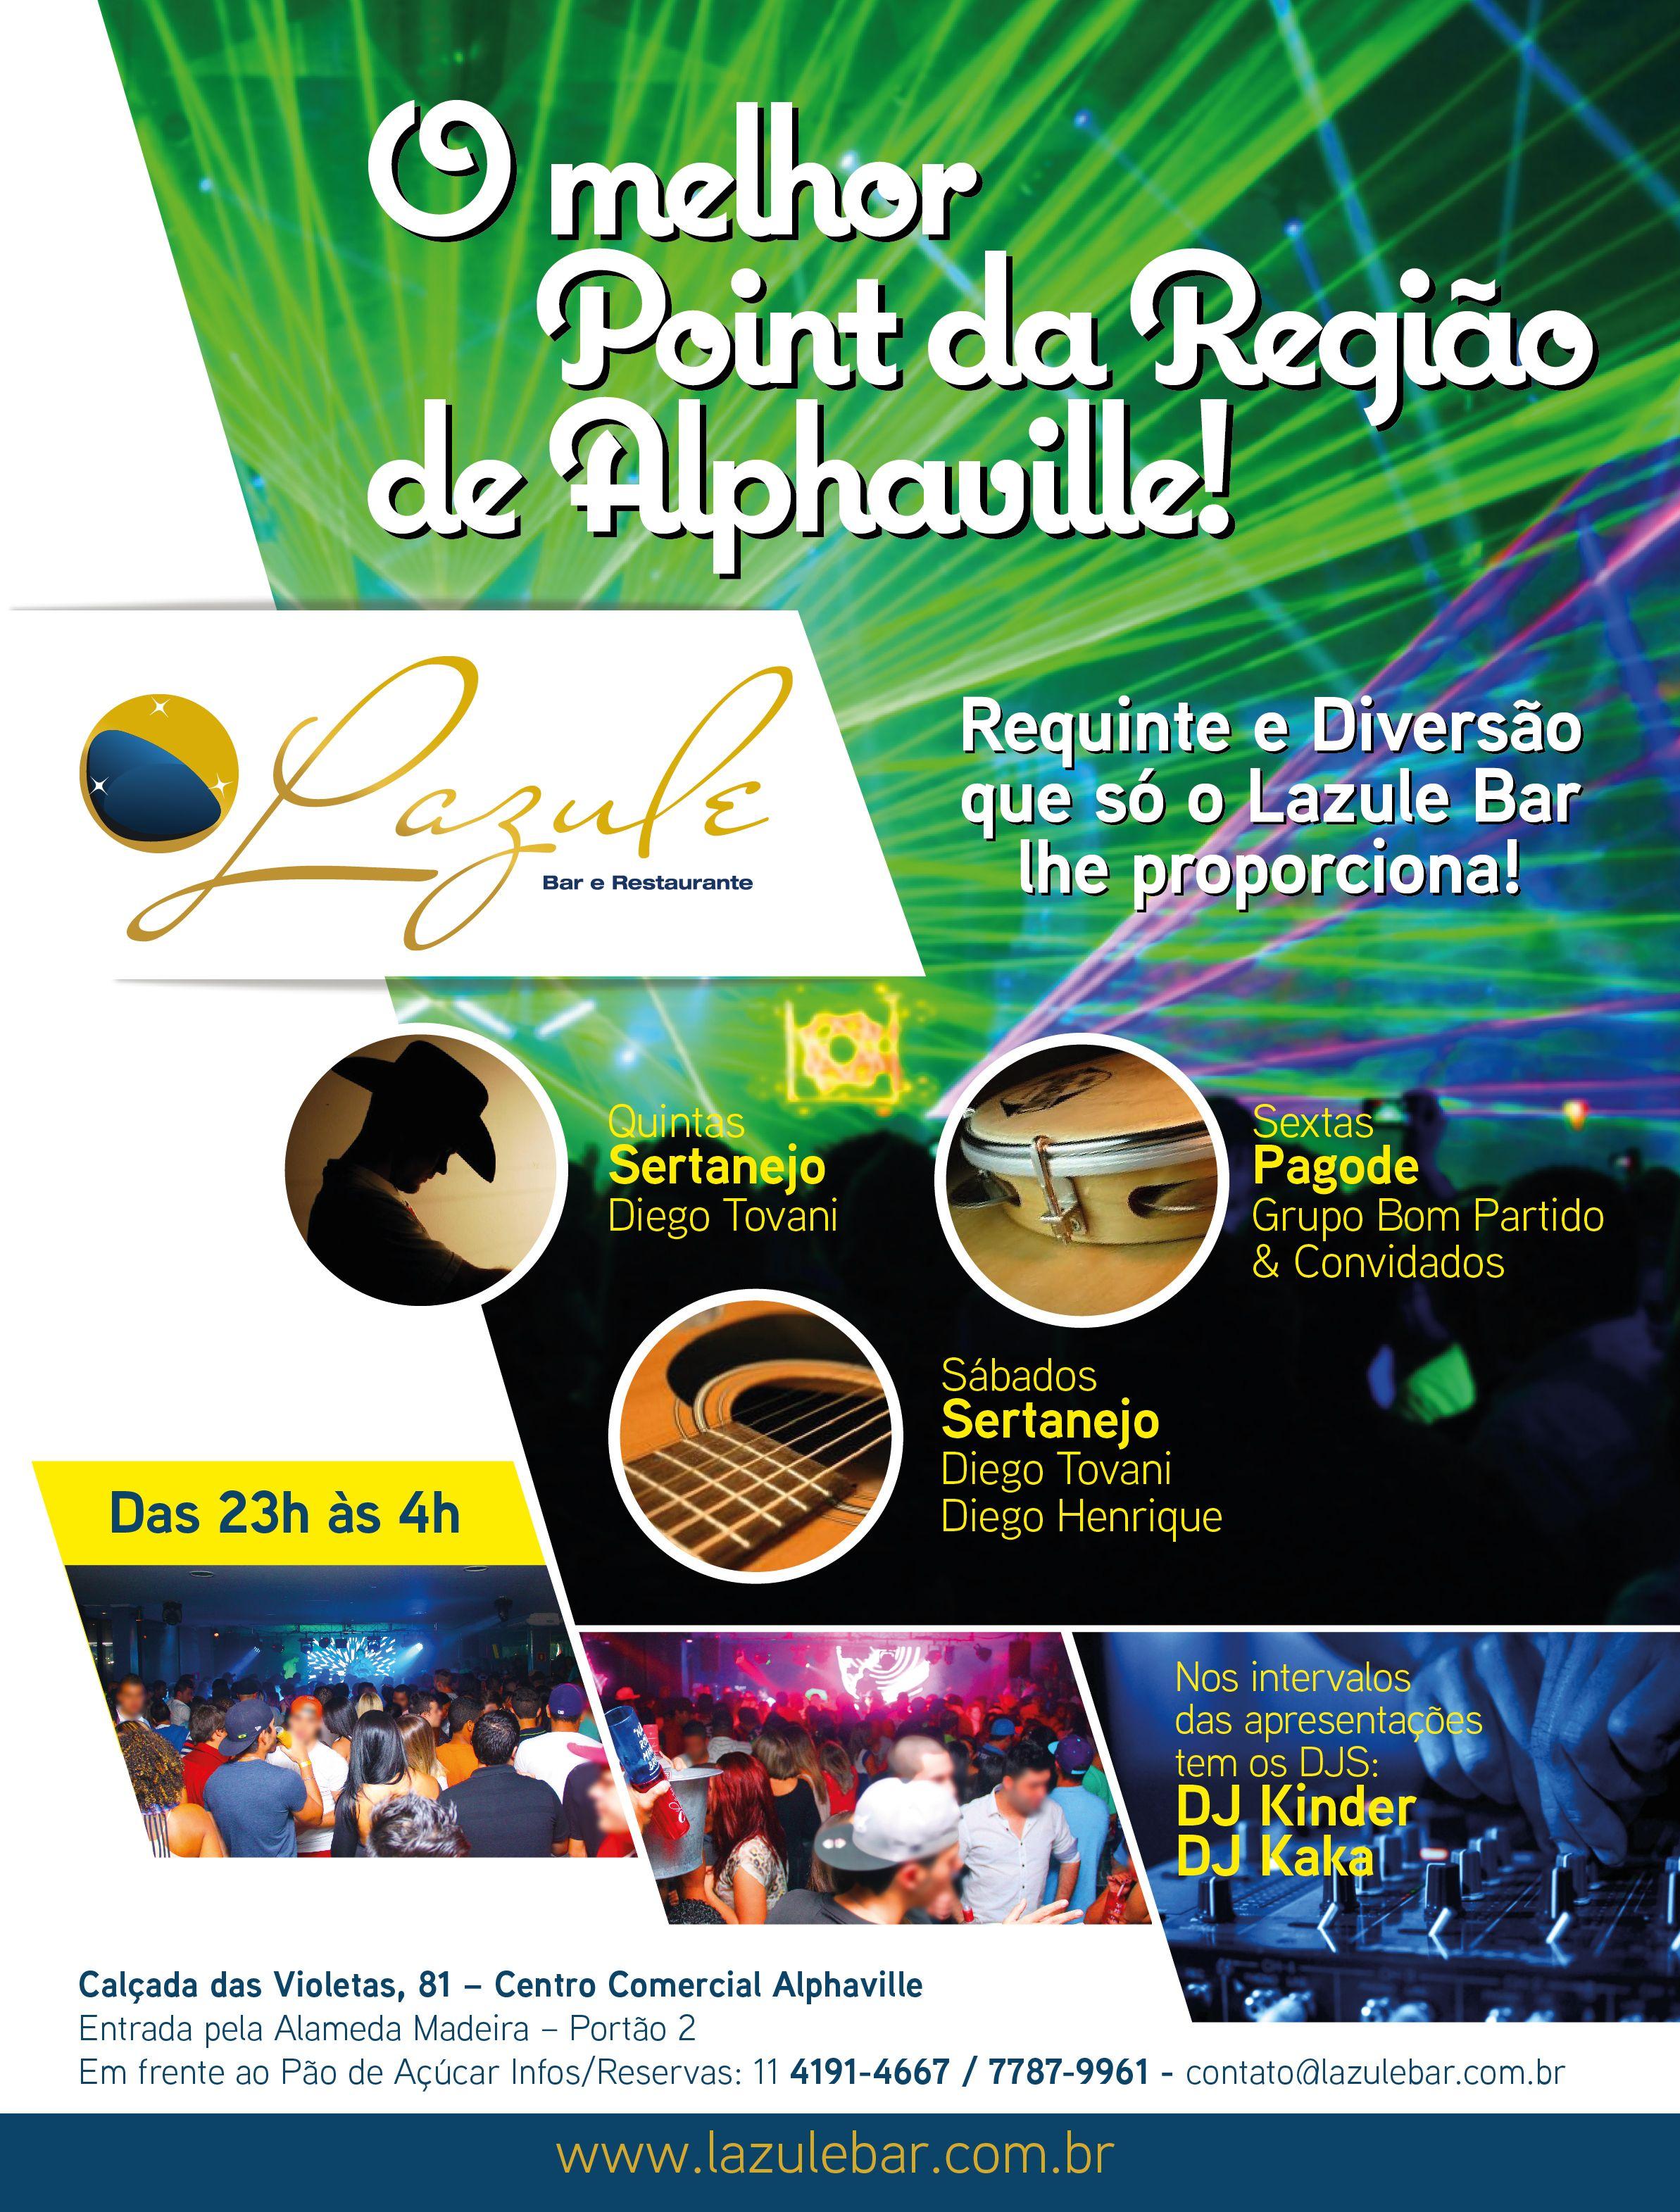 Advertising - Lazule Bar - Art director